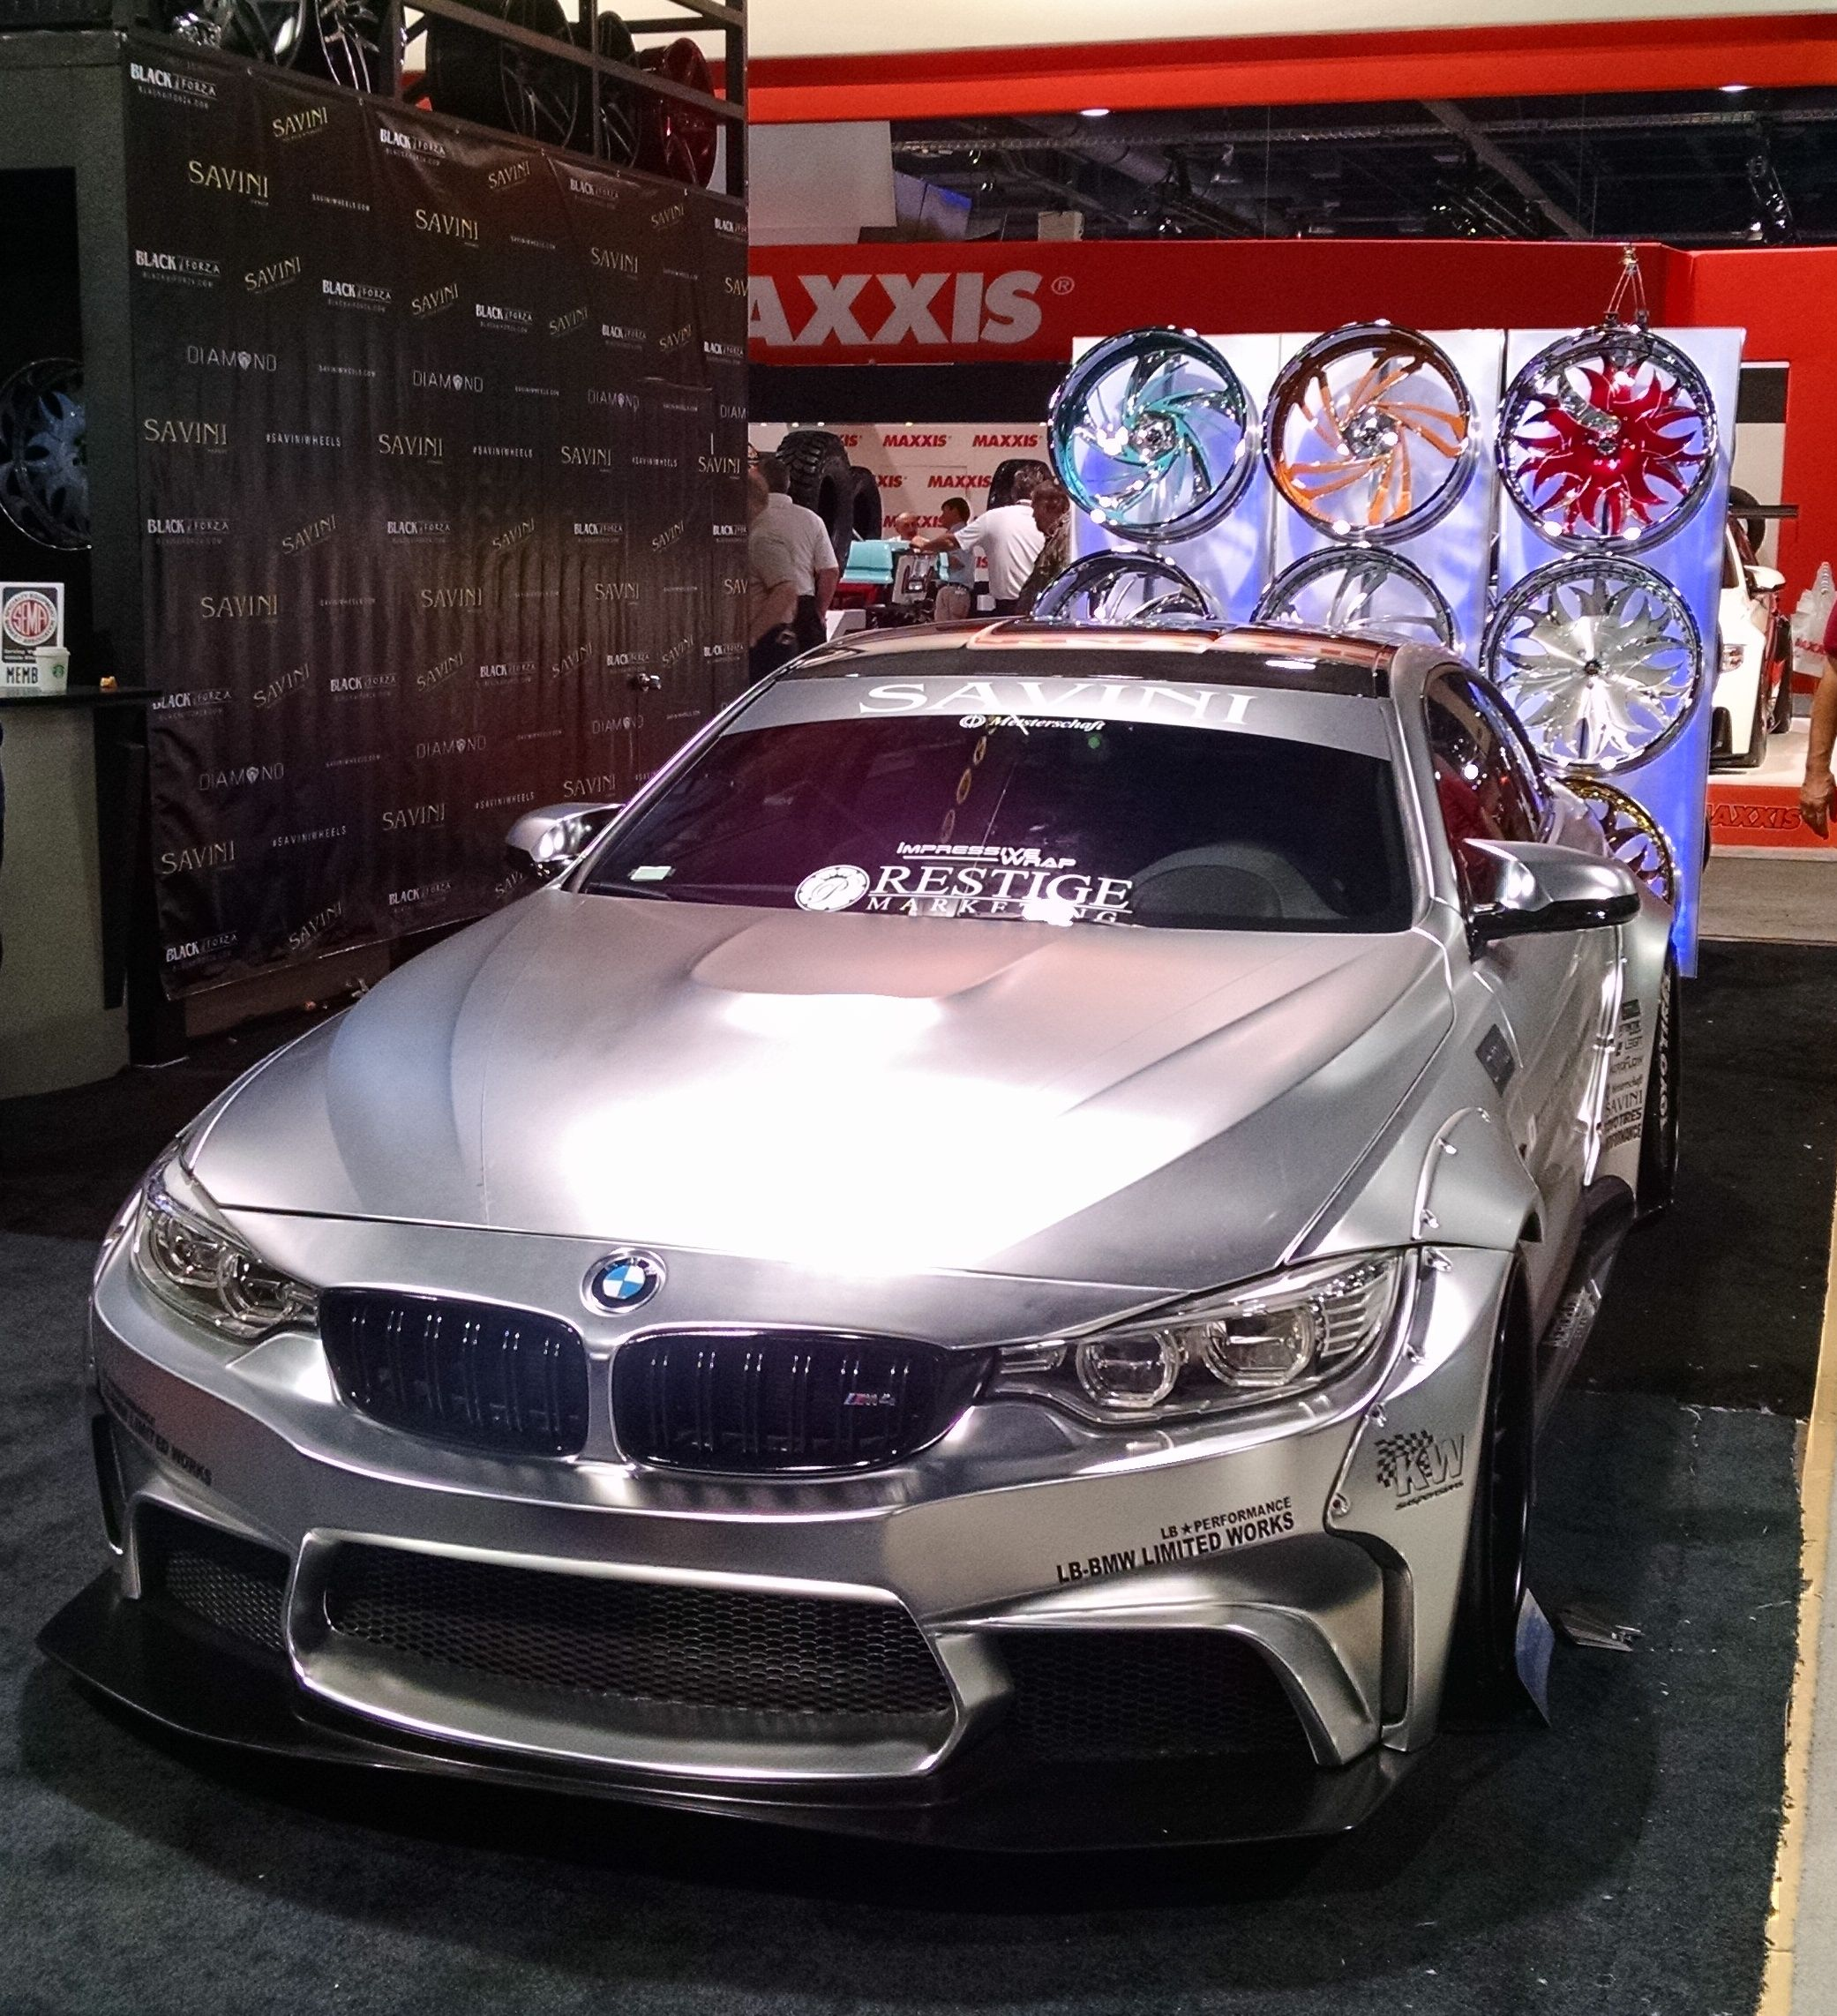 Wild Chrome BMW M4 From Liberty Walk. Savini Wheels. SEMA